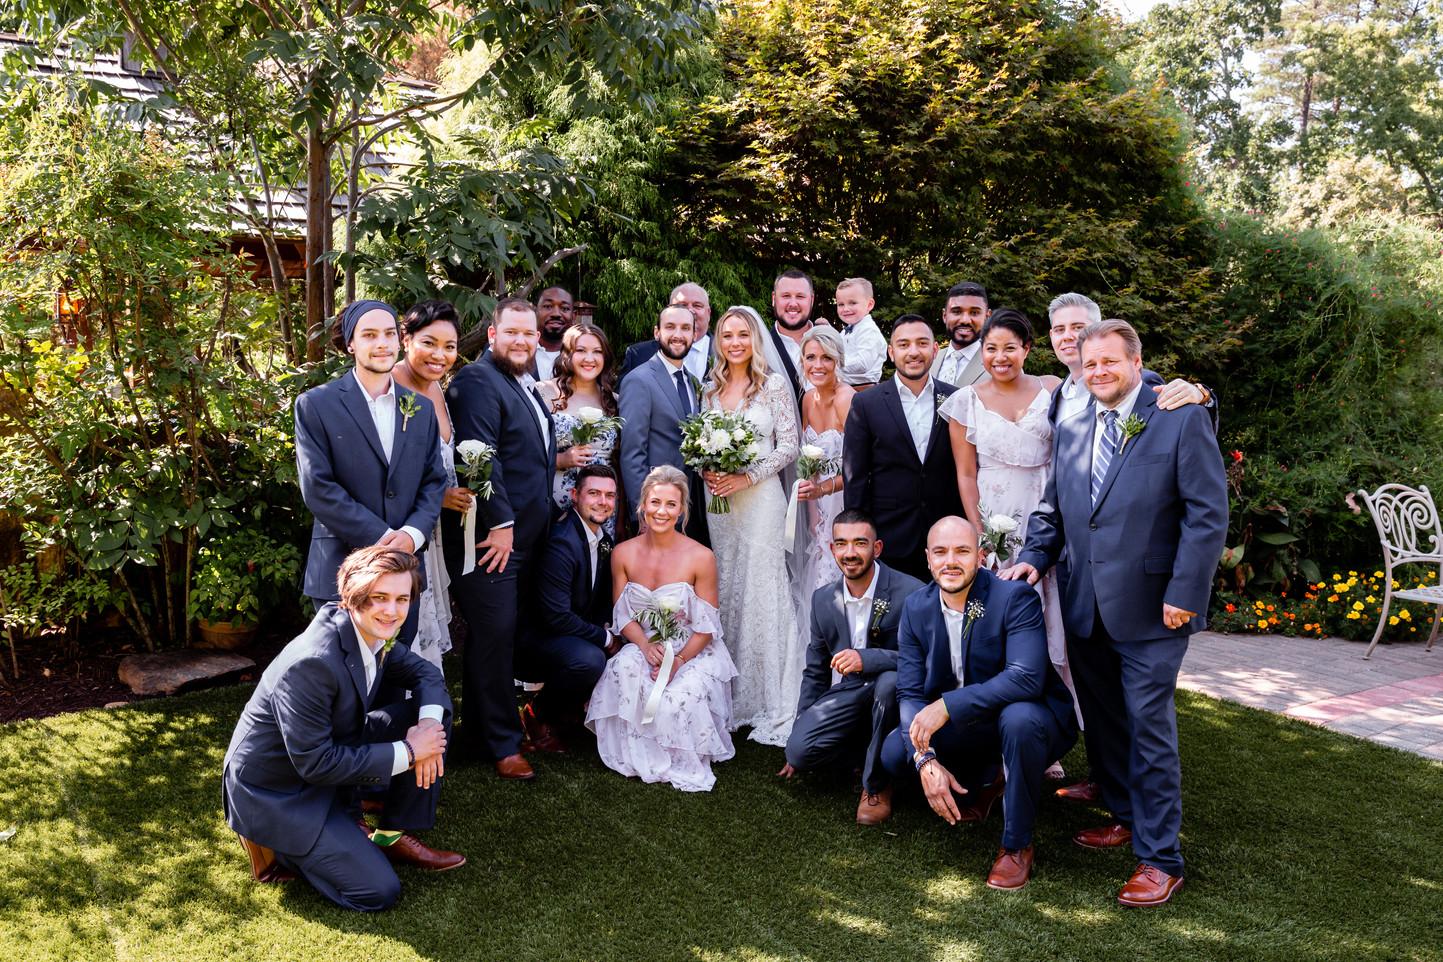 Arlen-Katelyn-Wedding-328.jpg